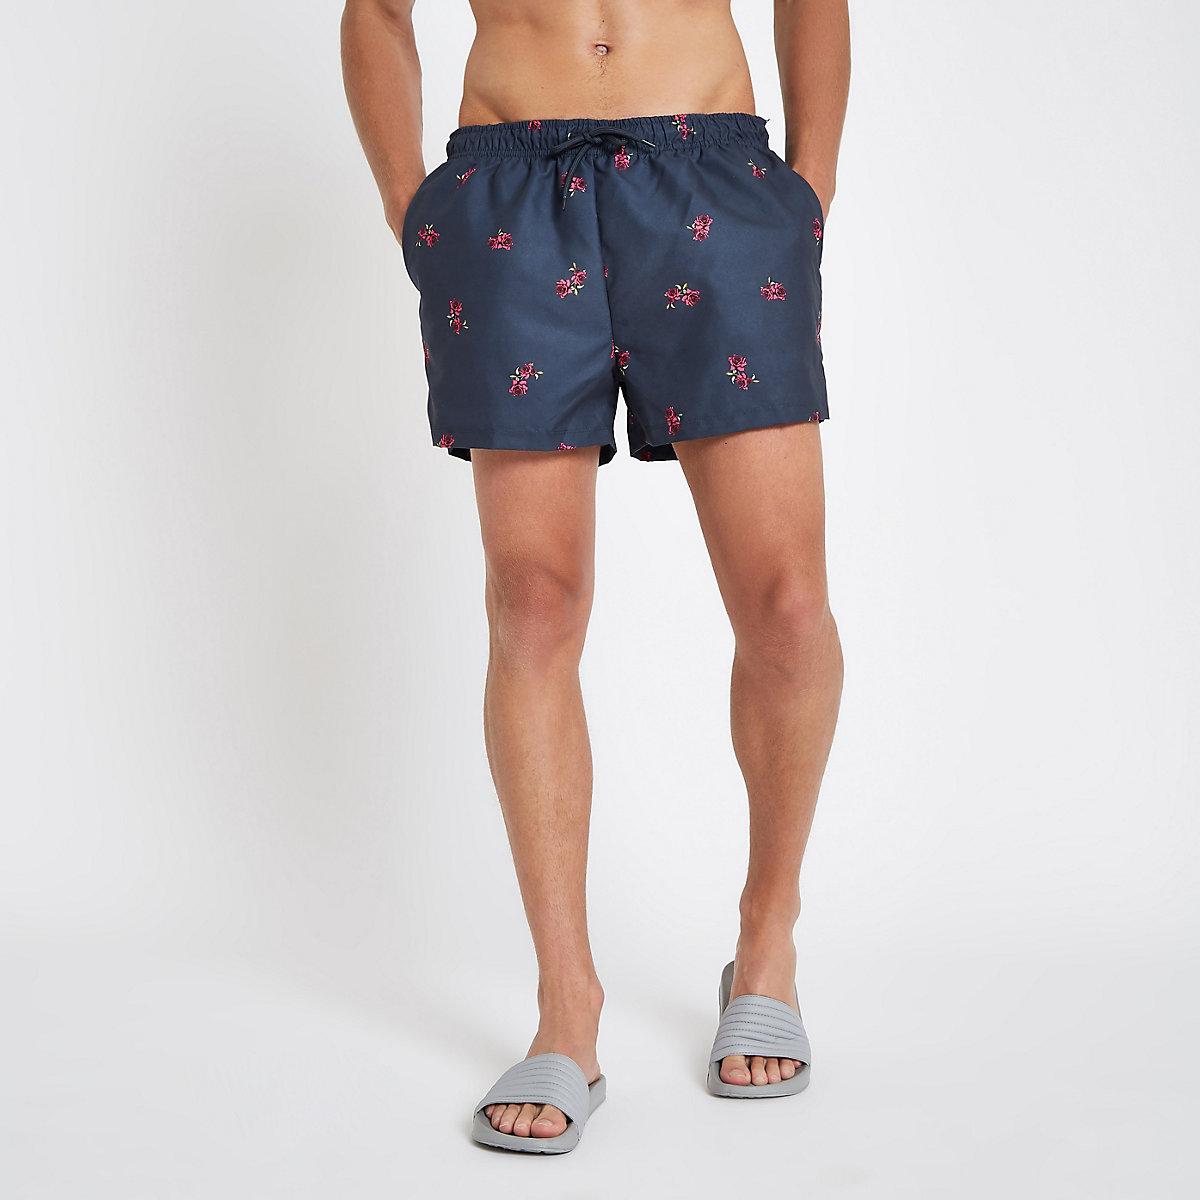 Navy rose print swim shorts